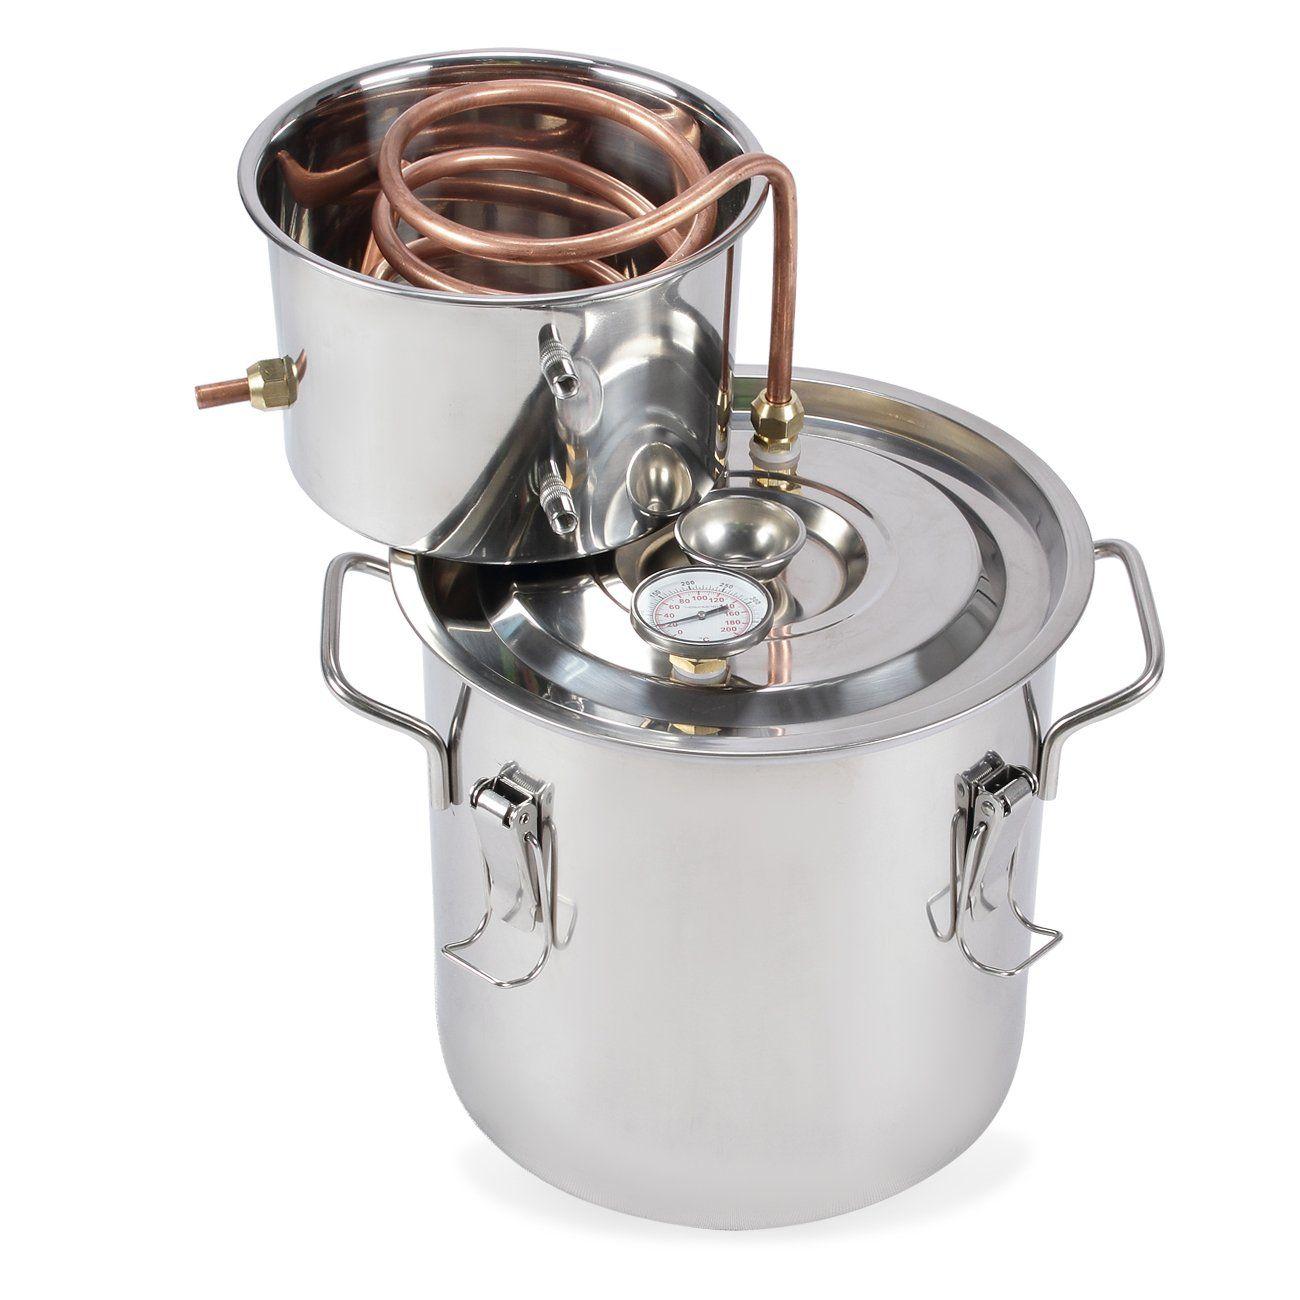 with distilling supplies: Distiller. Stainless steel ...